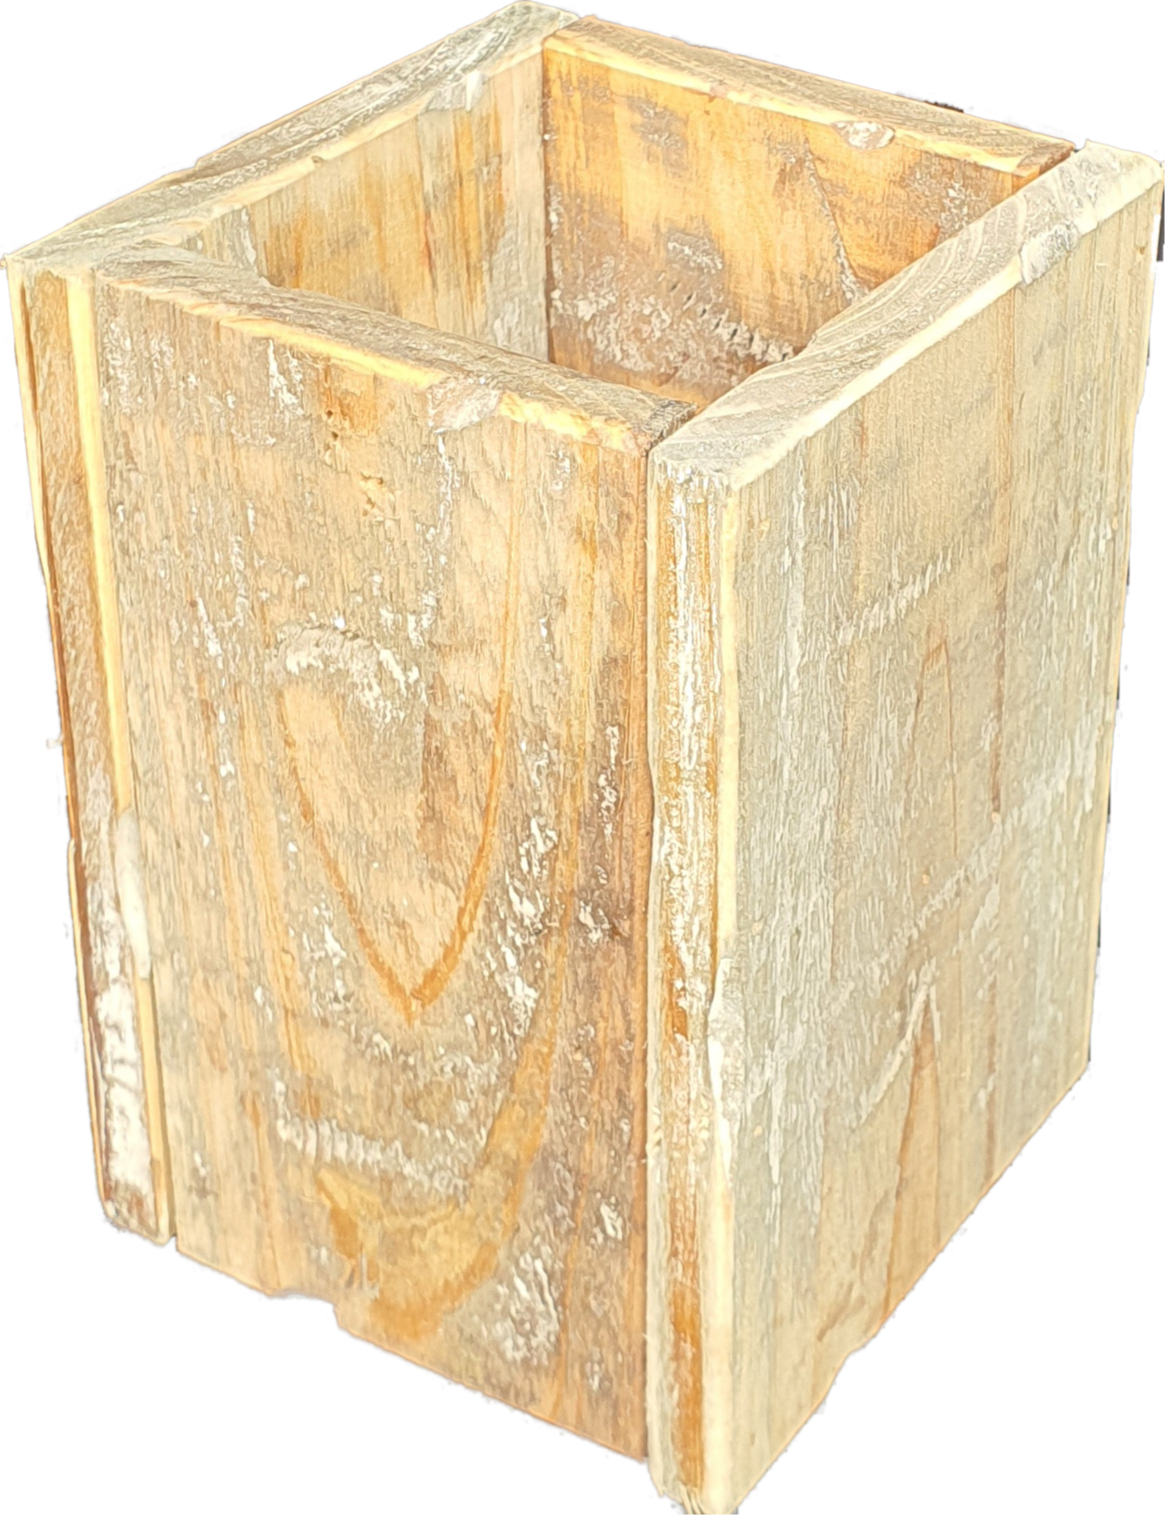 pot old dutchglass hold 2 sides 15-1